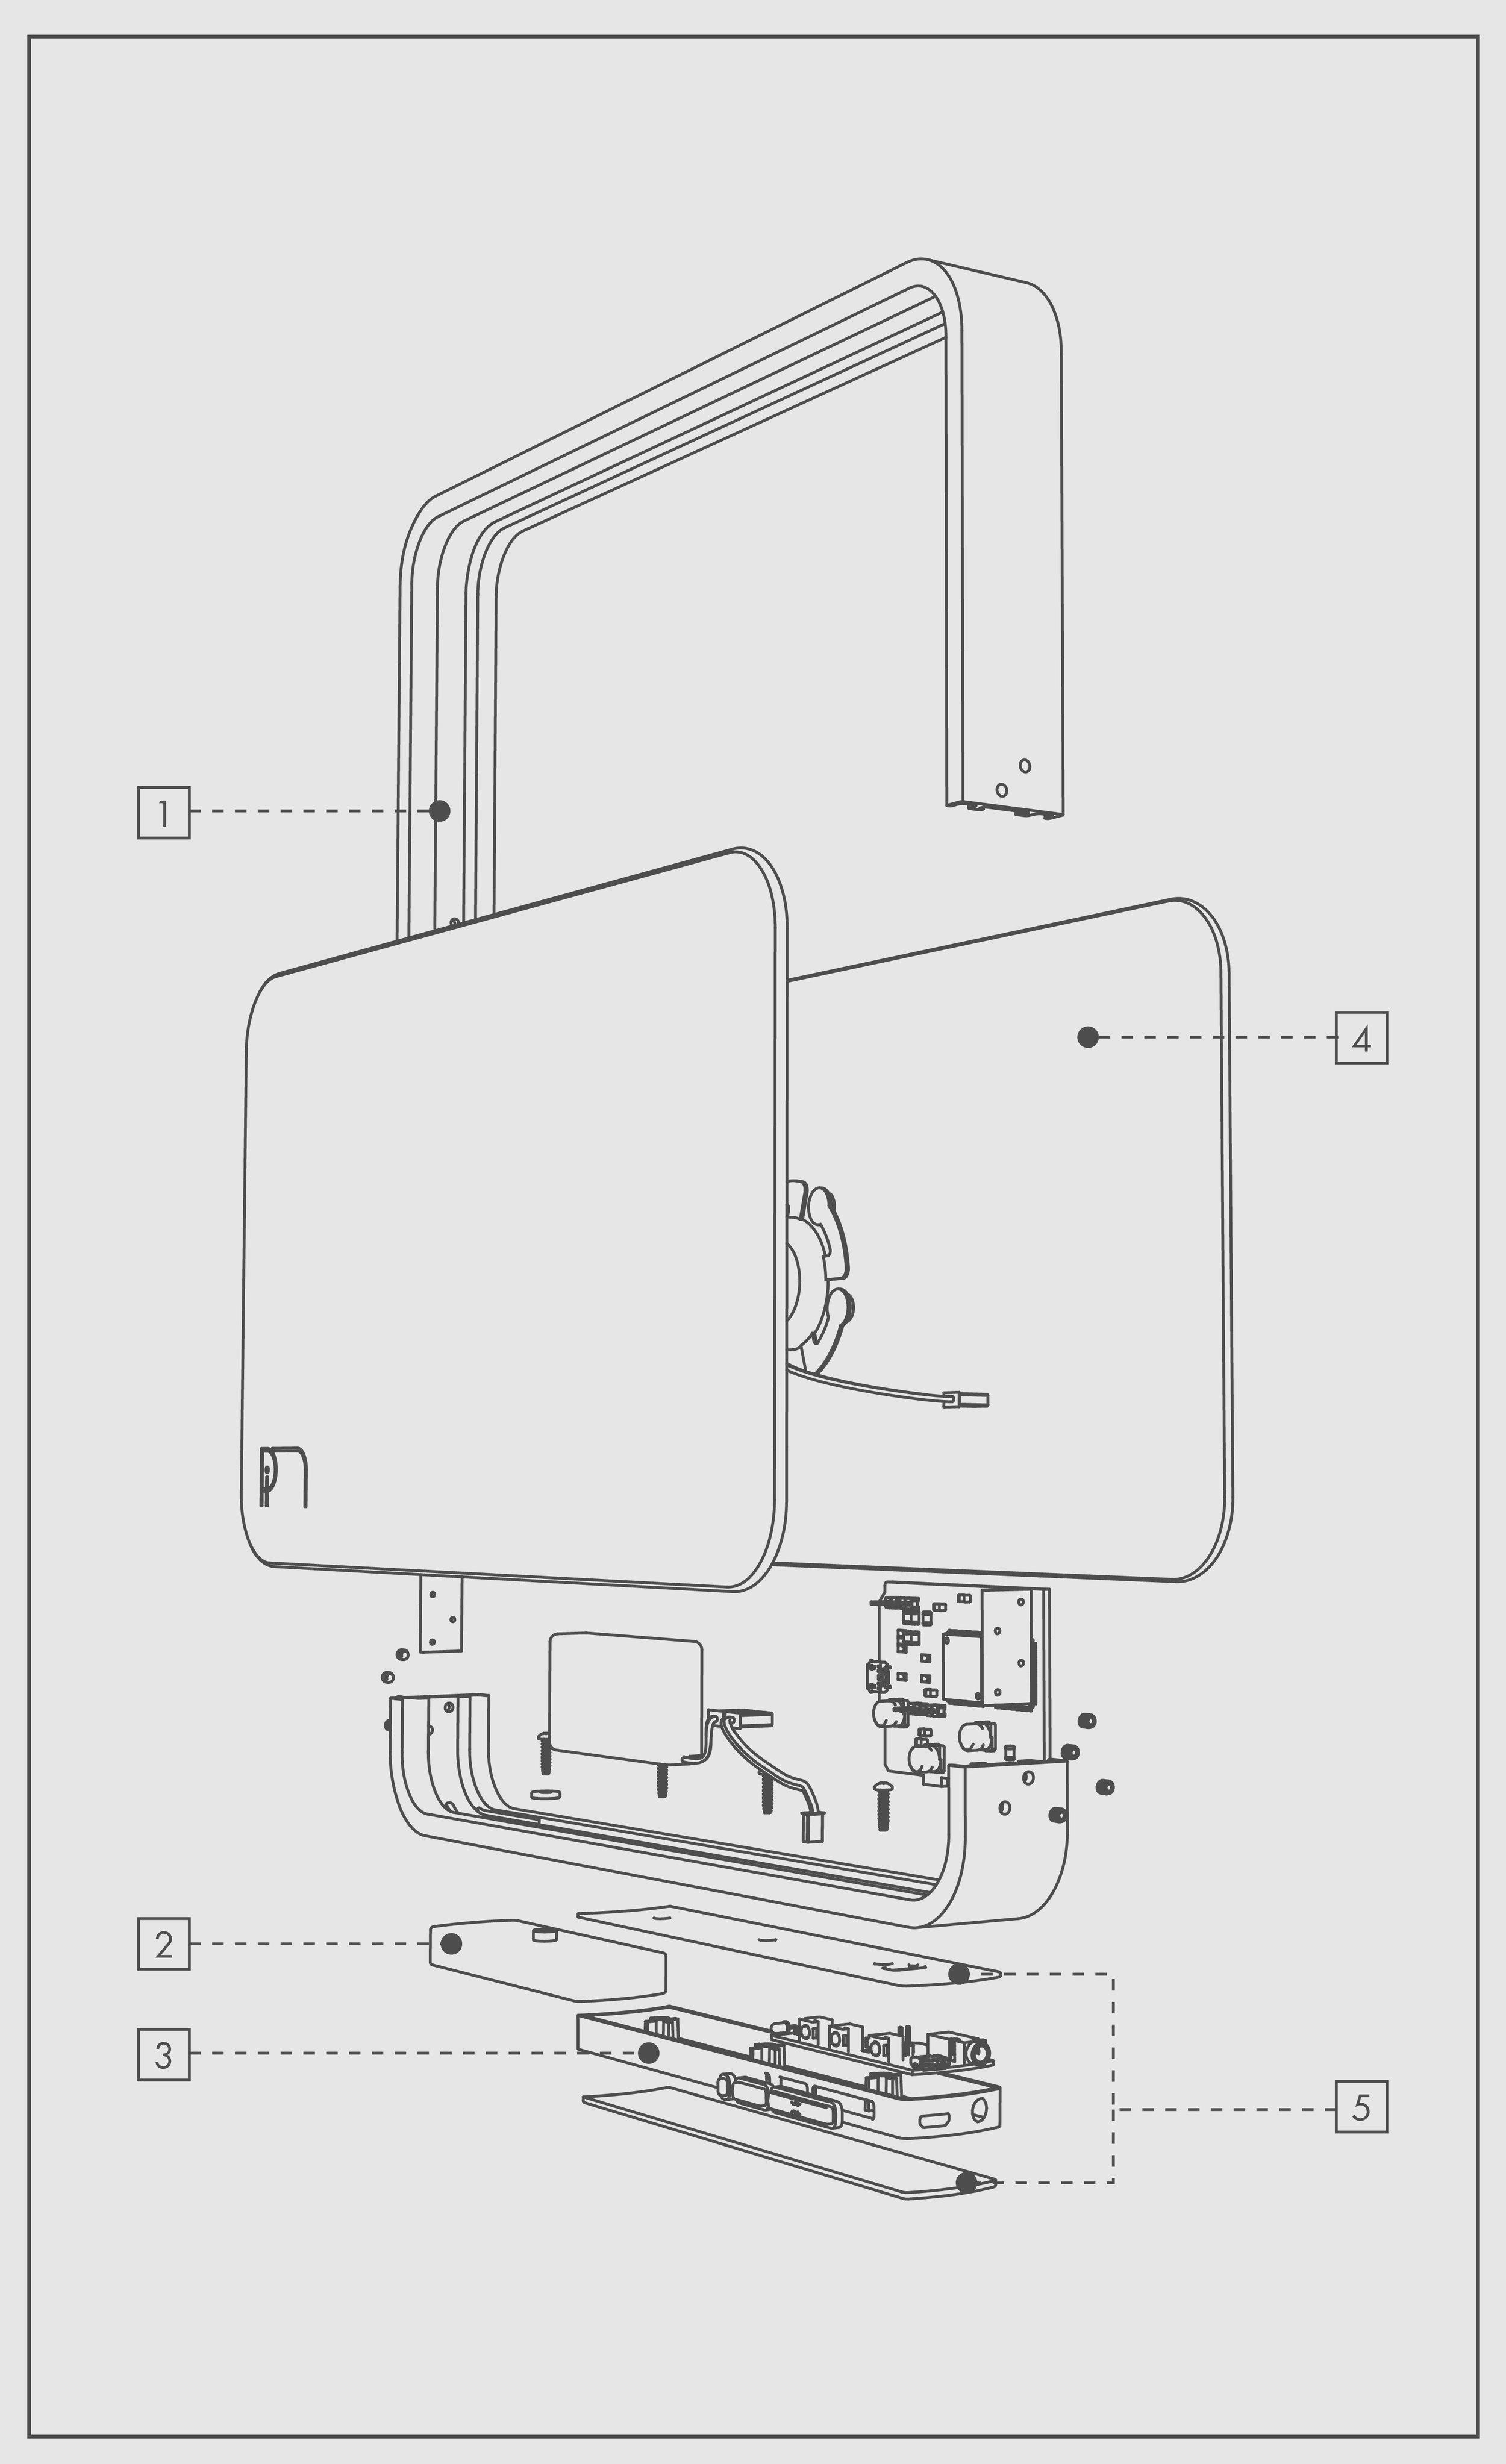 Kickstarter page 5-57.jpg